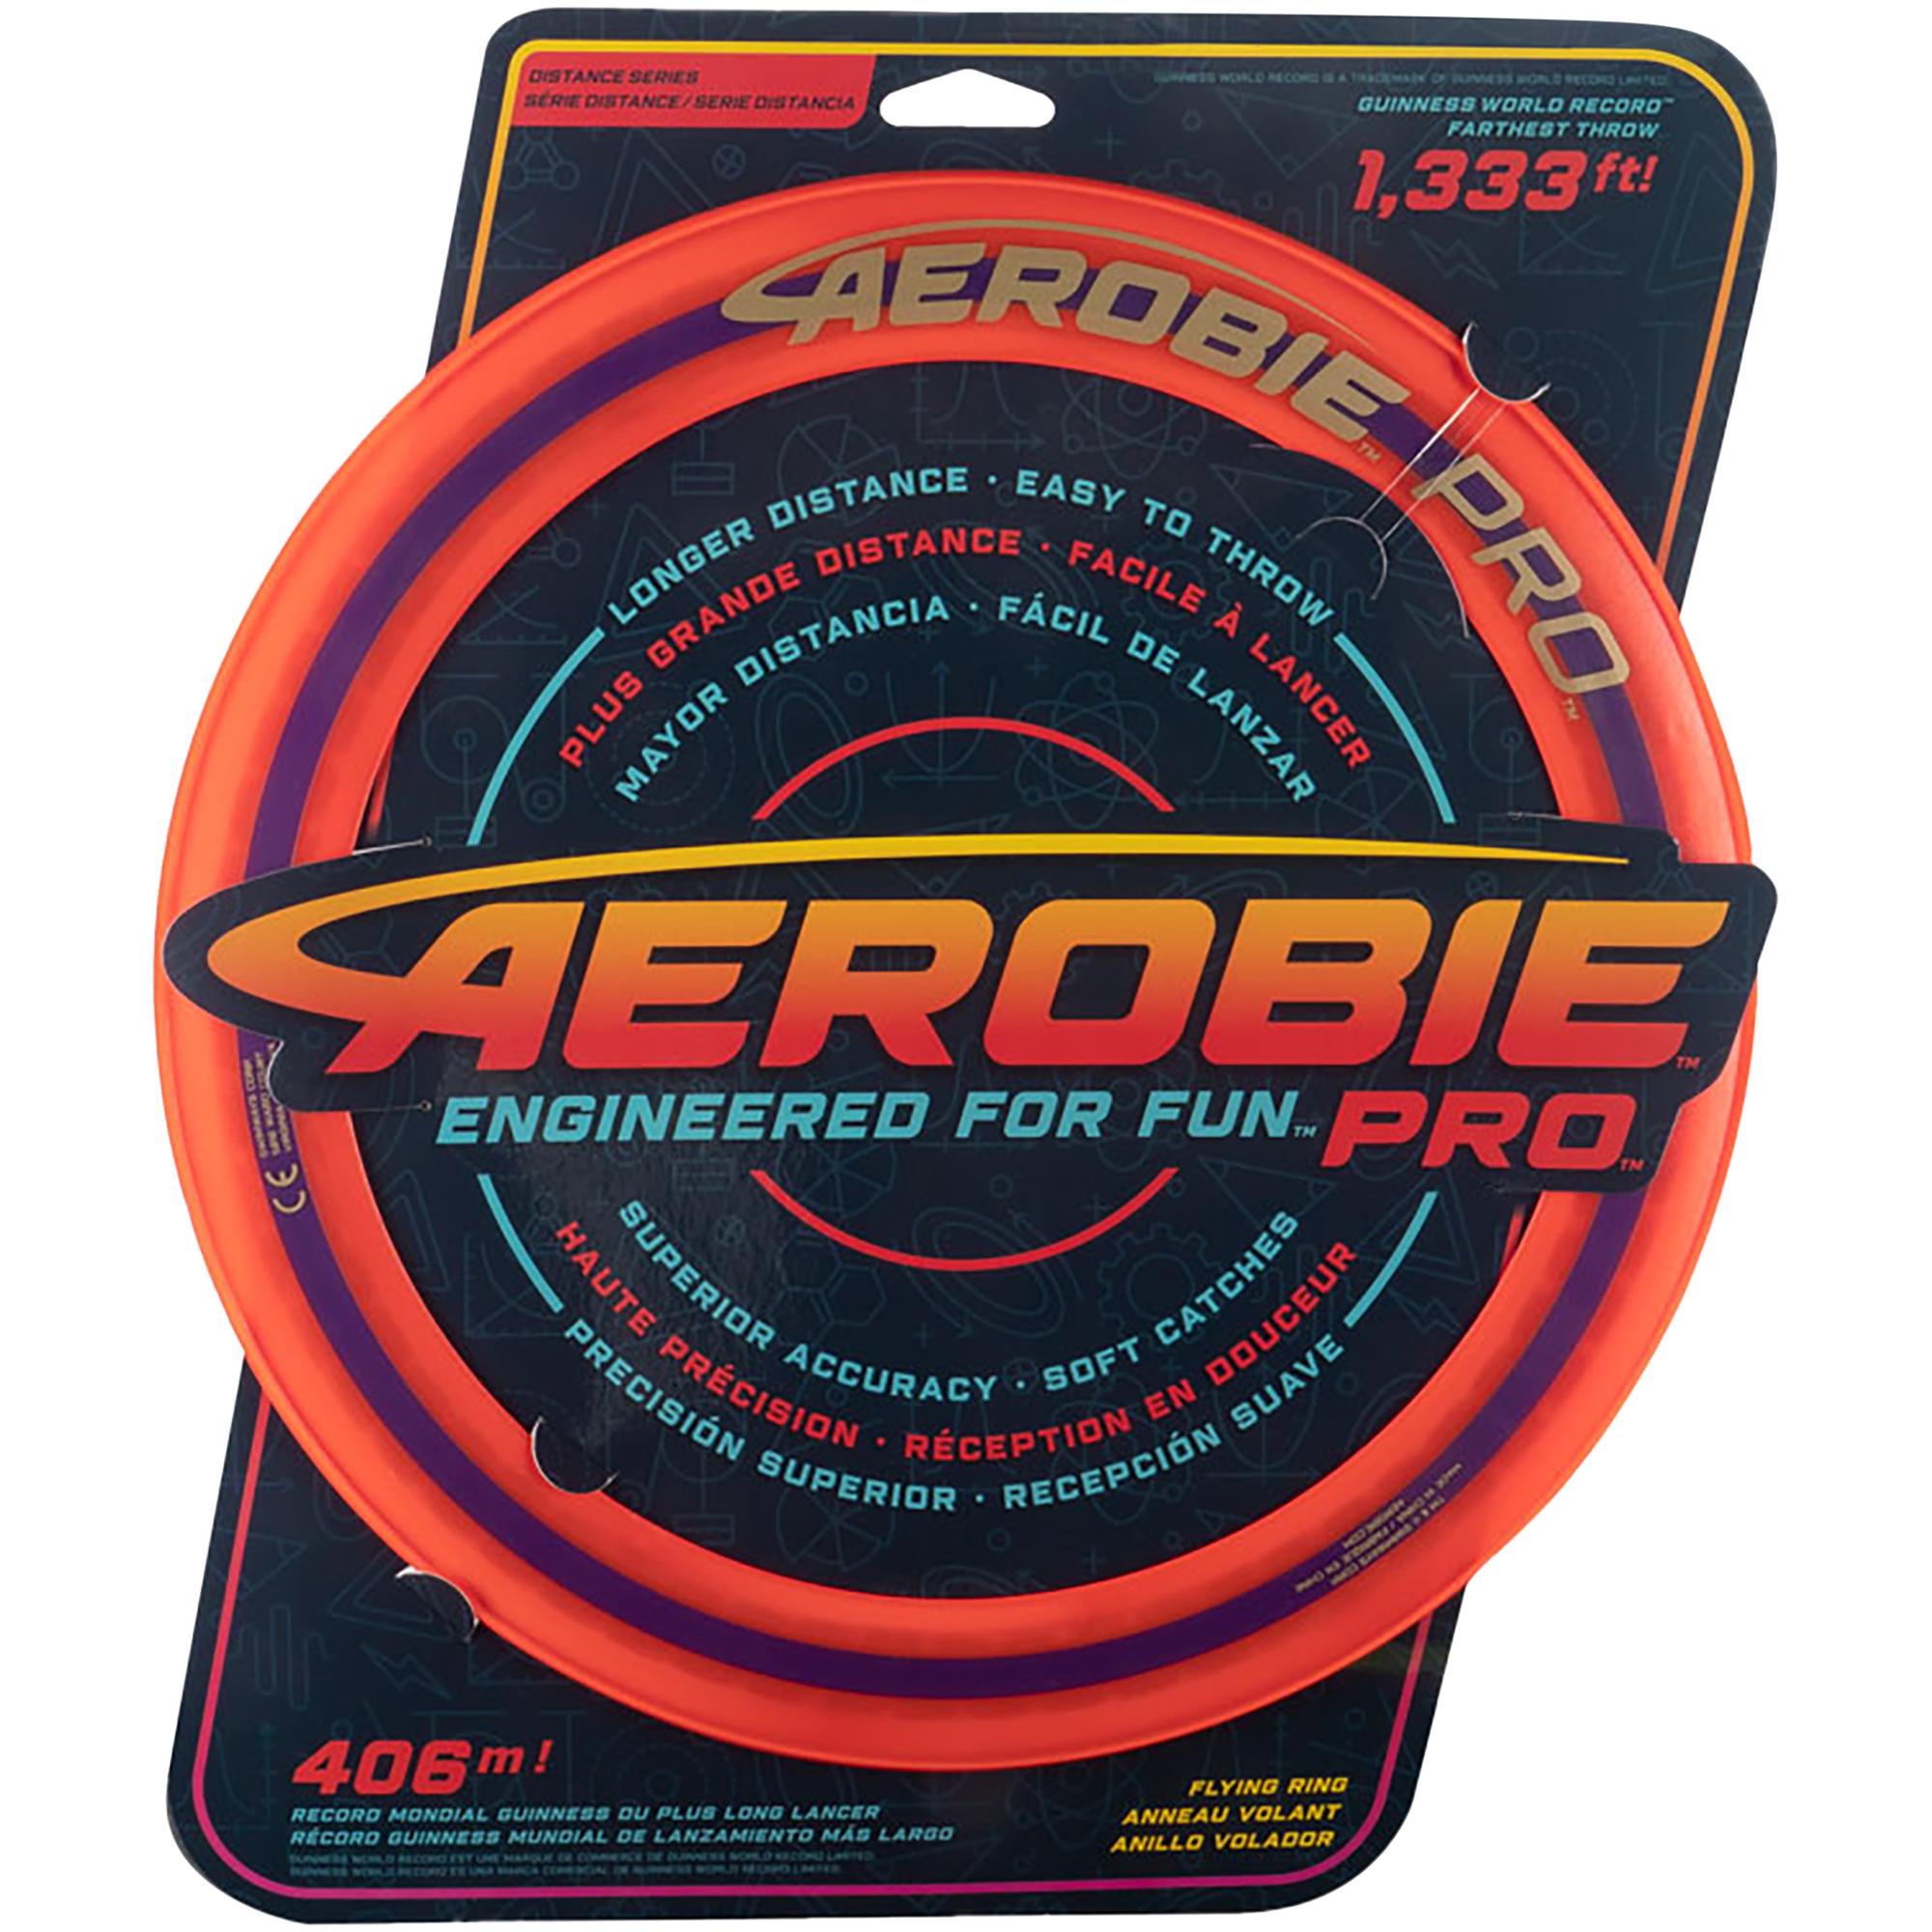 Aerobie Pro ring, frisbee STD Orange